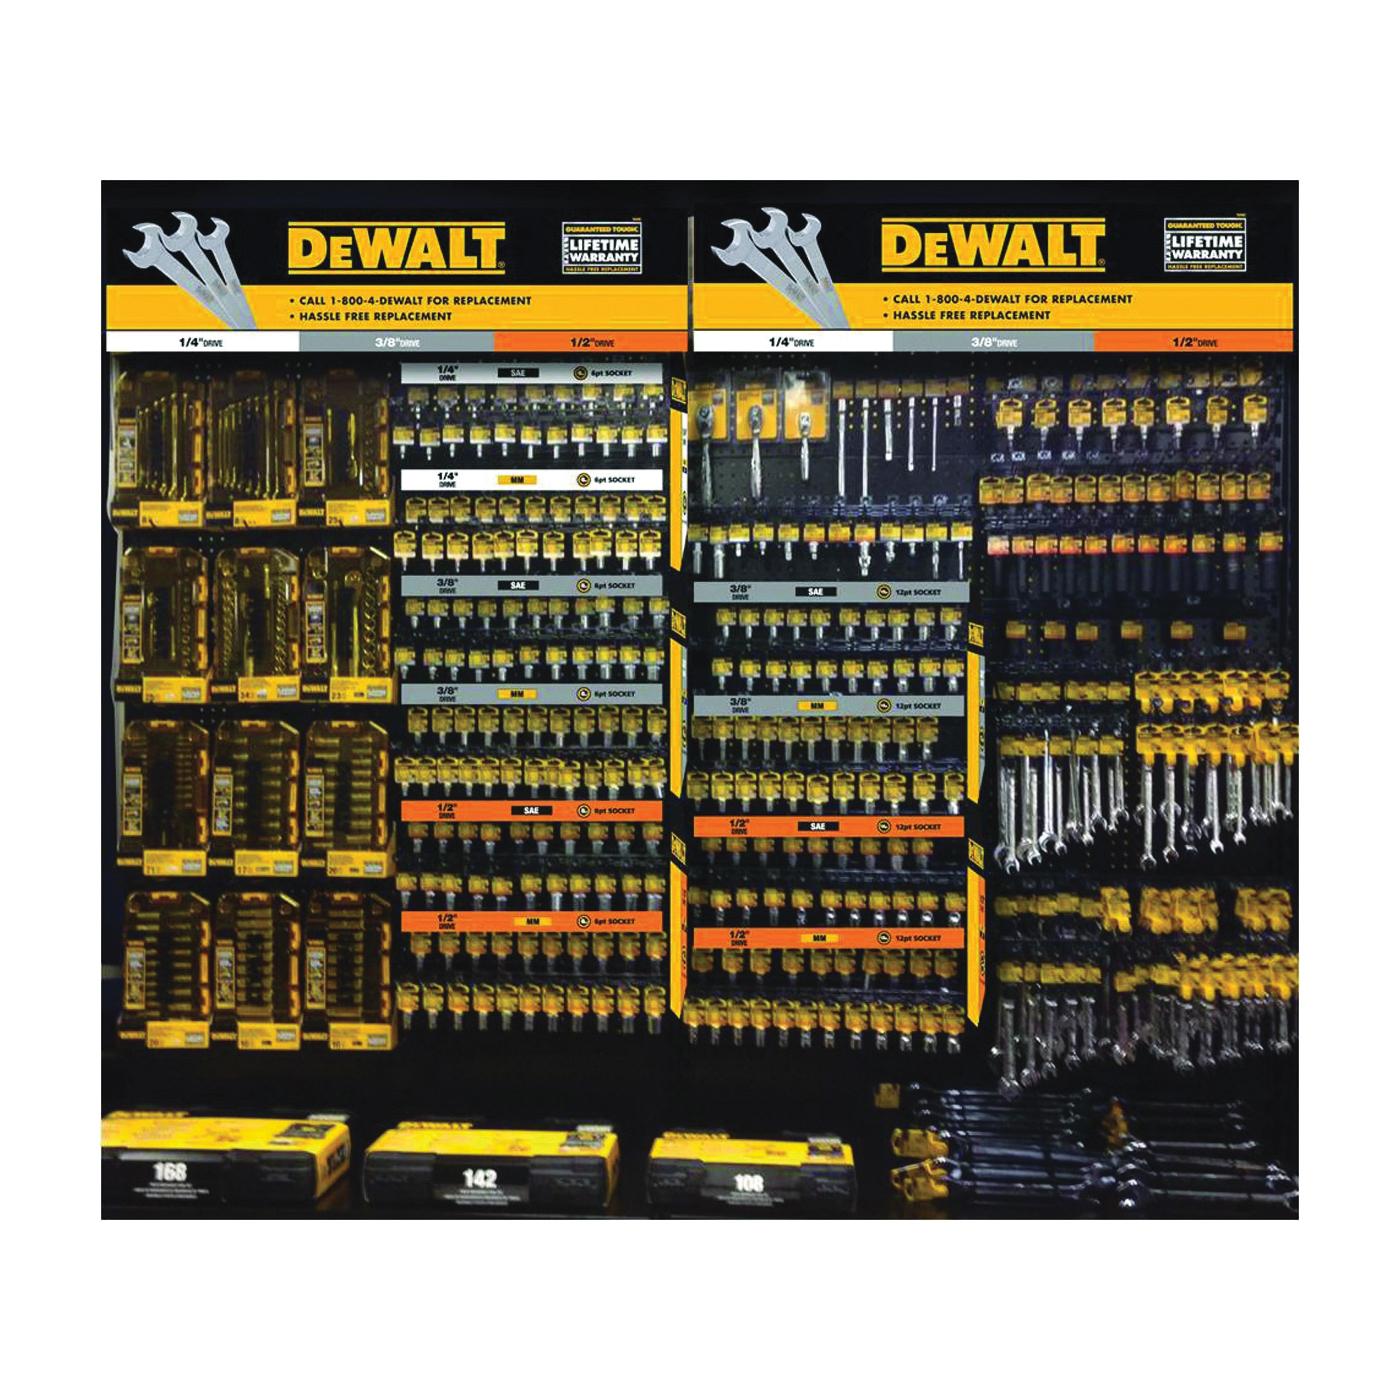 Picture of DeWALT DWMT74219 Ratchet Drive Accessory Set, Specifications: 3/4 in Drive Size